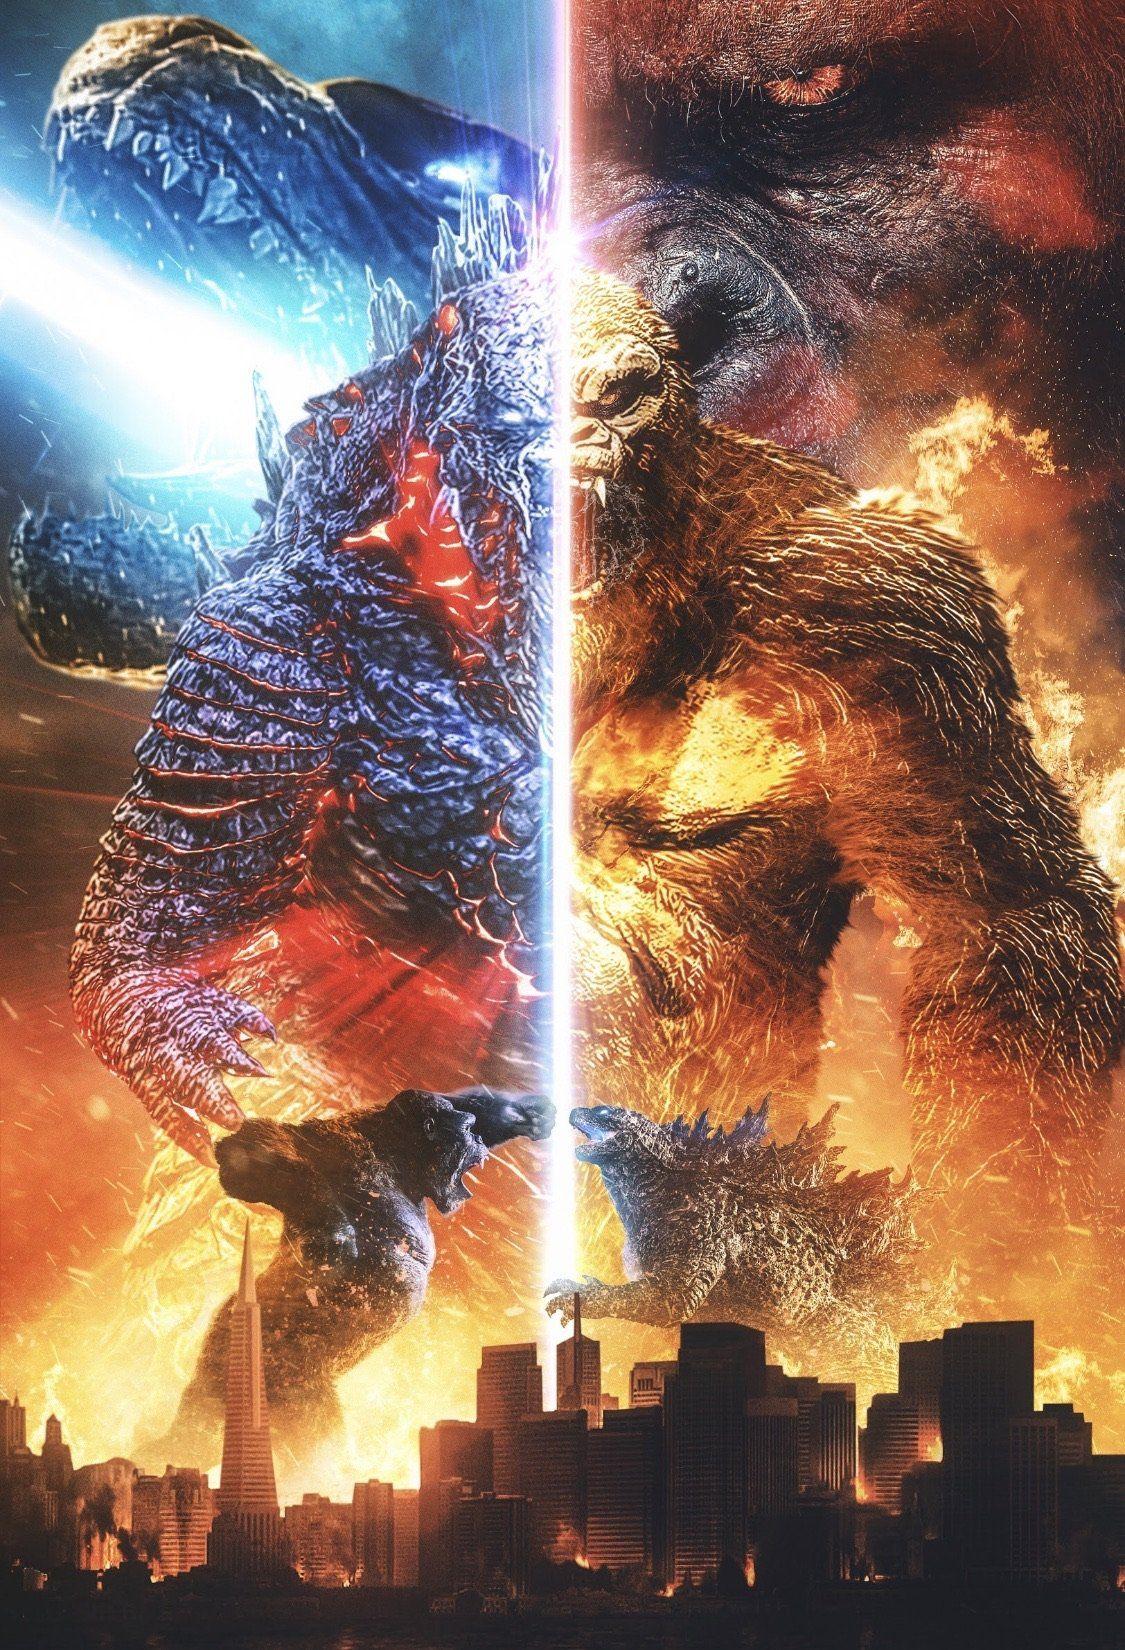 'Godzilla V Kong' Poster - 12 x 18